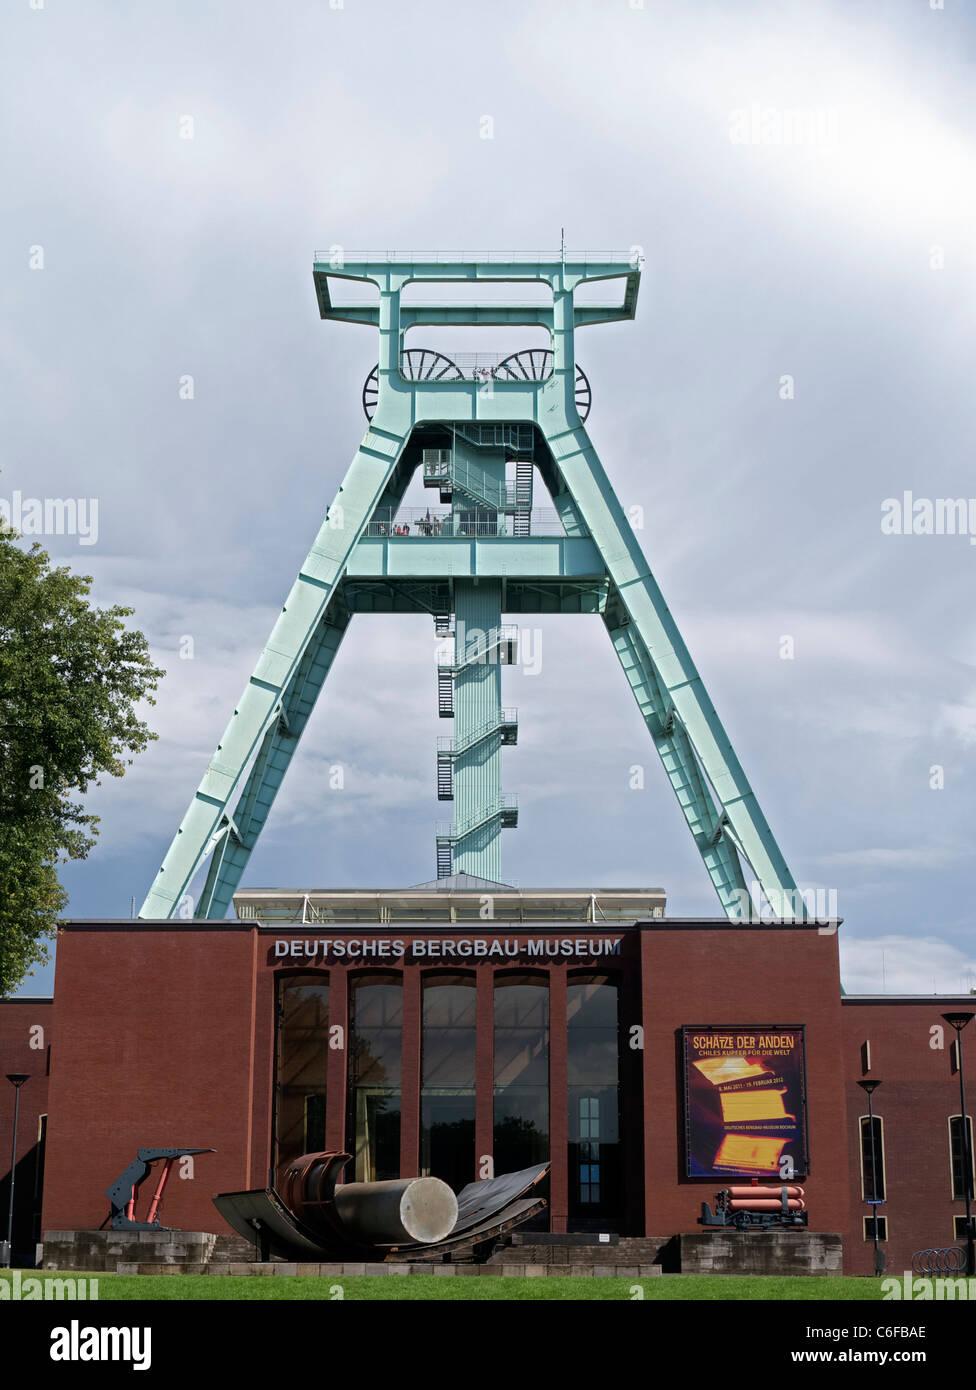 The Deutsches Bergbau-Museum or German Mining Museum in Bochum Germany - Stock Image